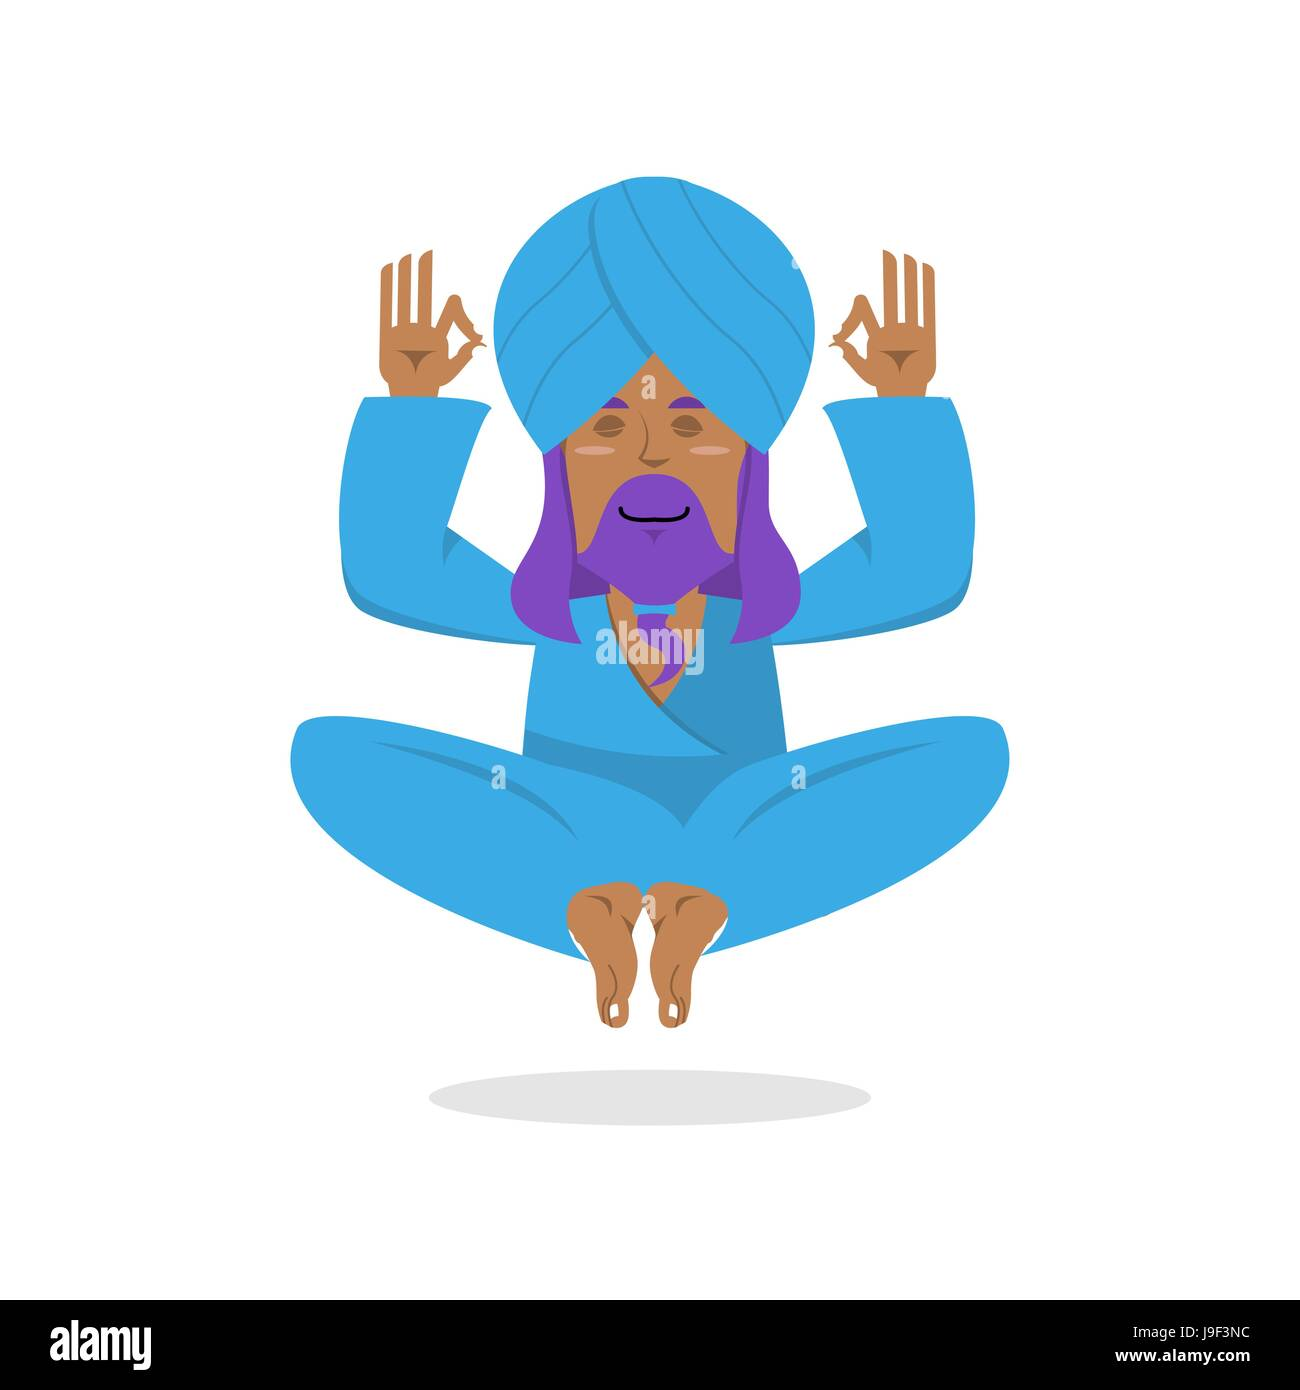 Indian yogi meditates. Yogi on white background. Good yogi in turban isolated. Human knowledge and enlightenment. - Stock Vector